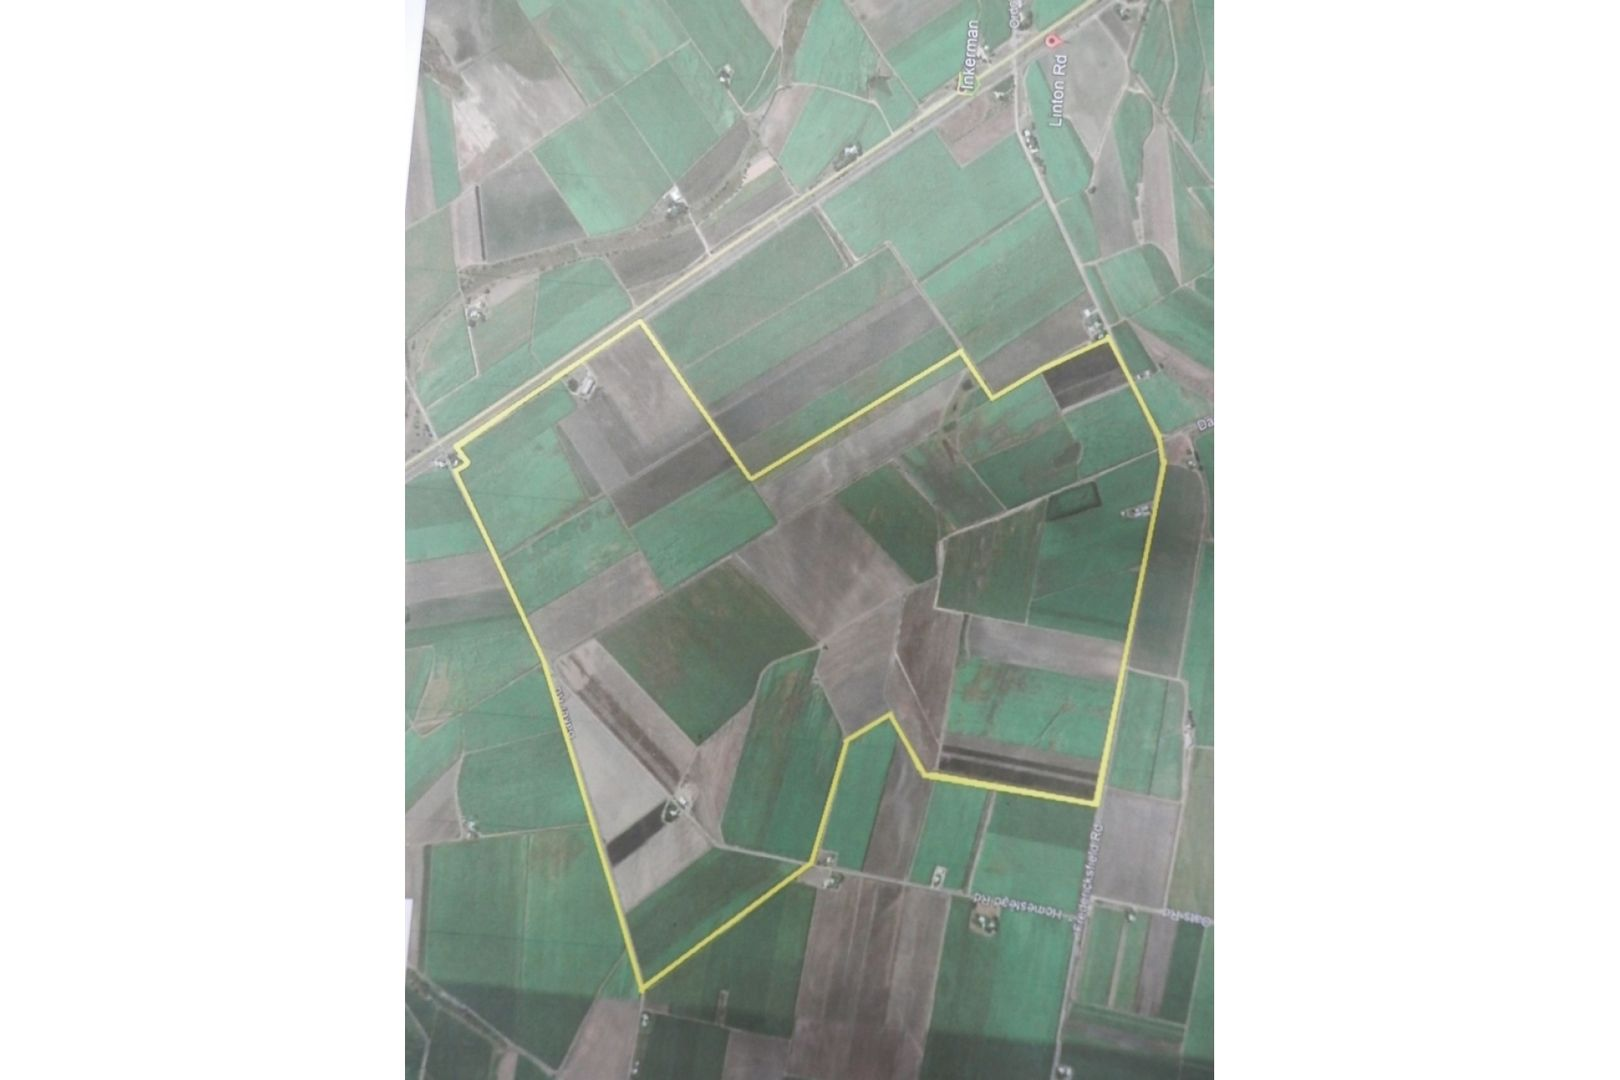 184 Homestead  Road, Fredericksfield QLD 4806, Image 0